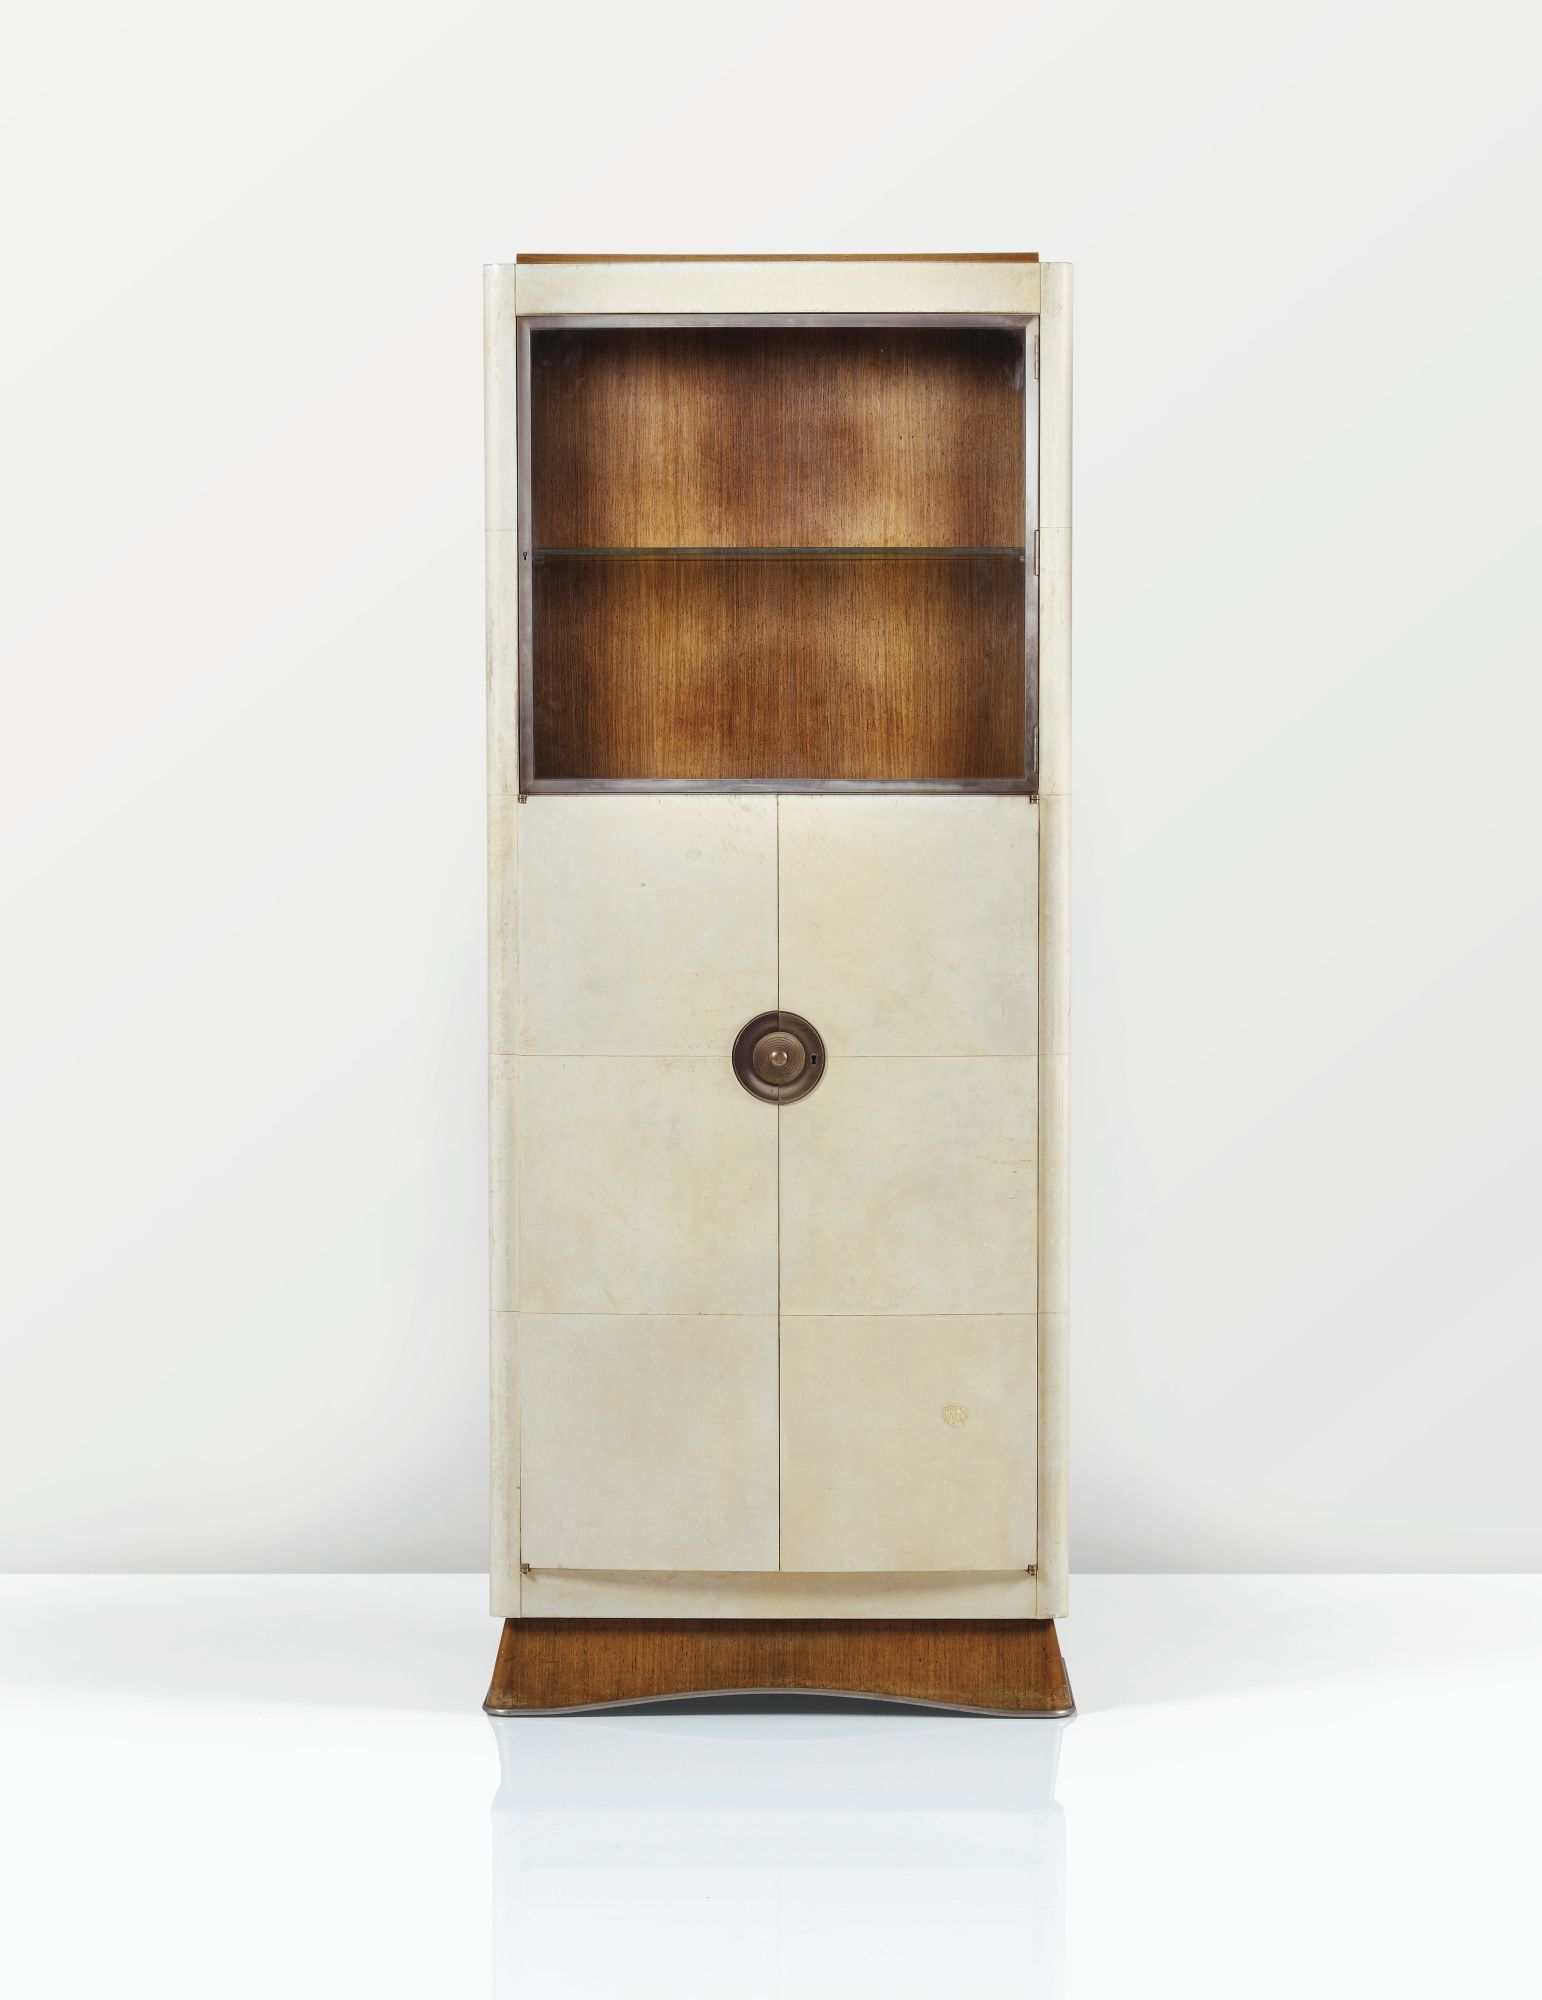 Dominique andré domin marcel genevrière 1883 1962 1885 1967 meuble de collectionneur vers 1930 a vellum rosewood and nickel plated